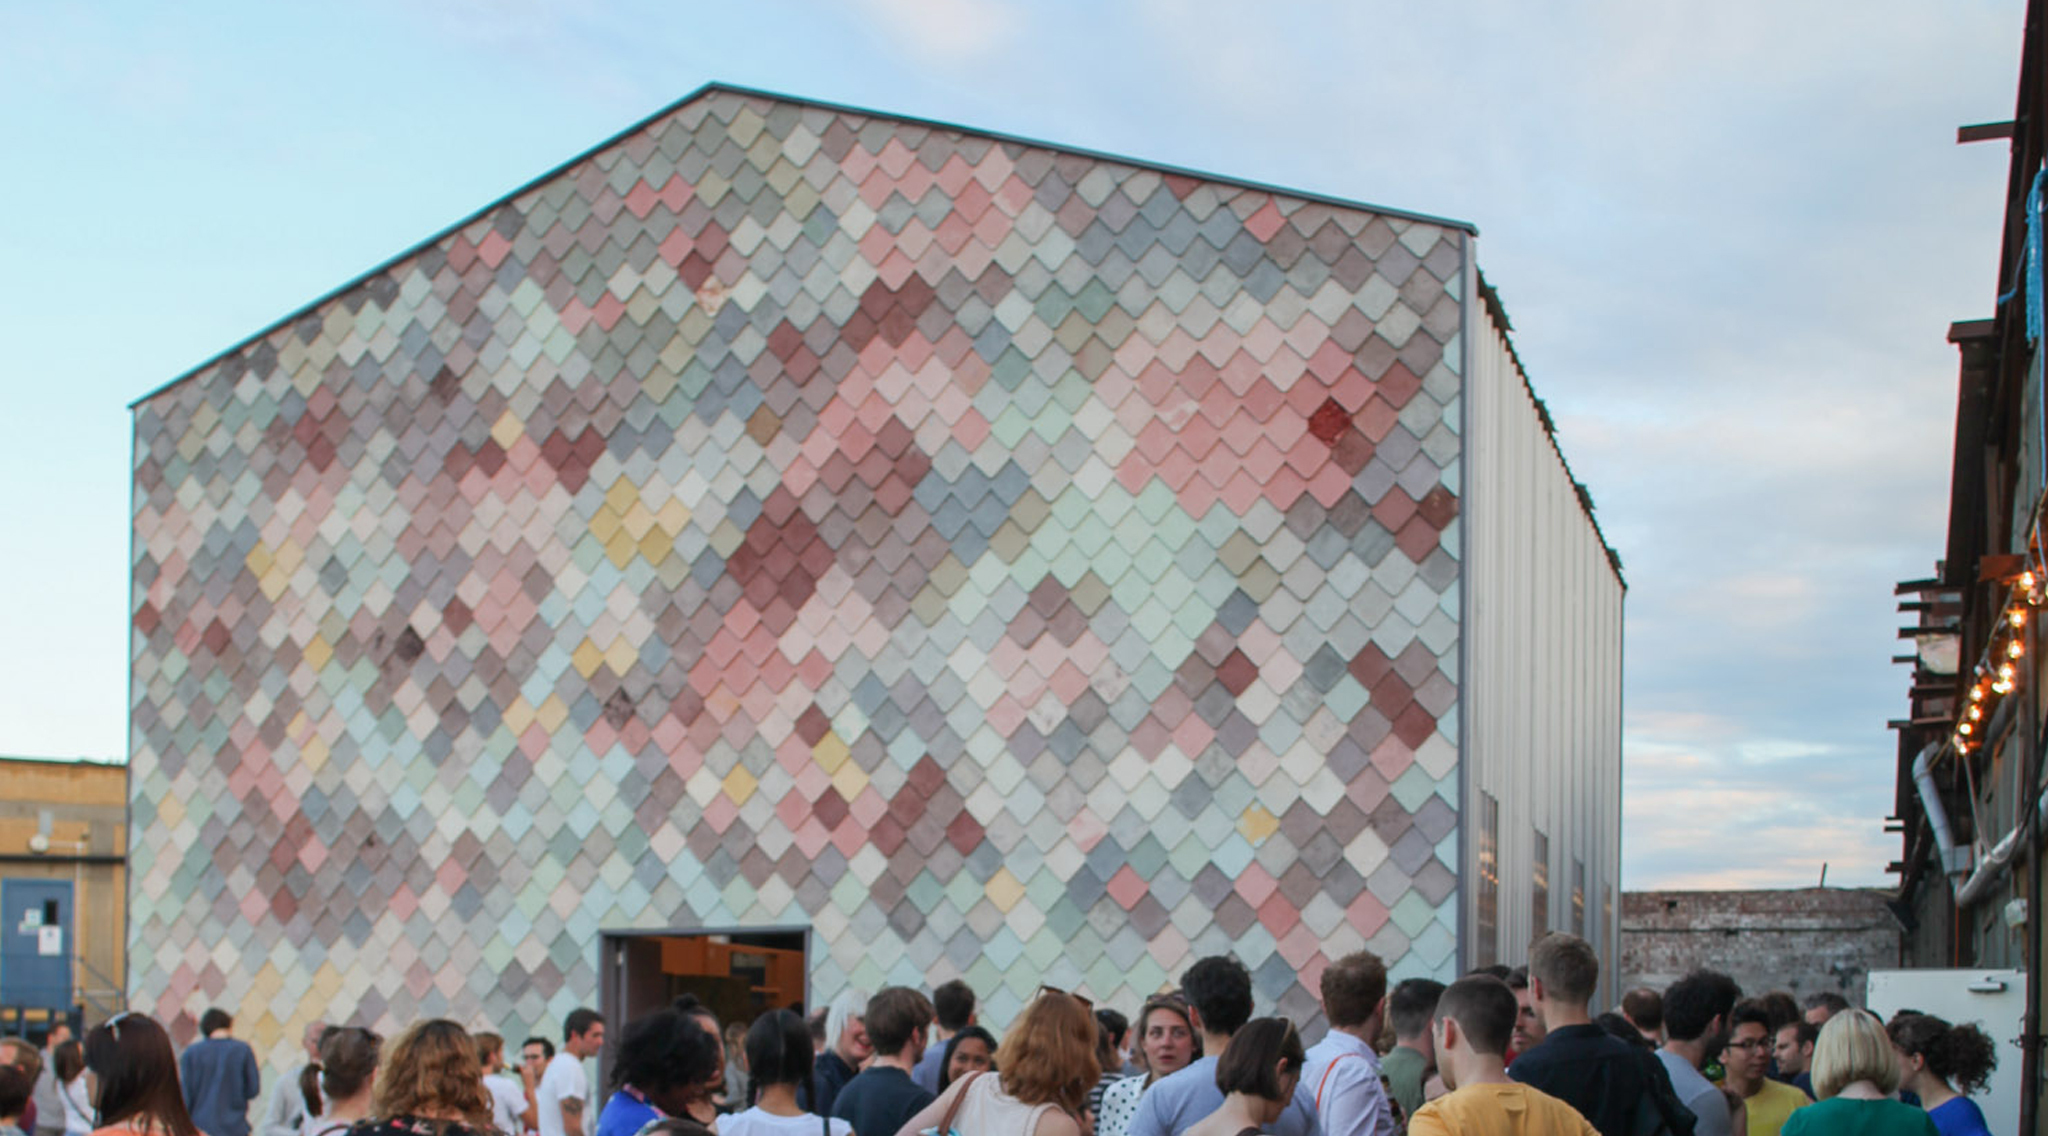 Best buildings in London: yardhouse